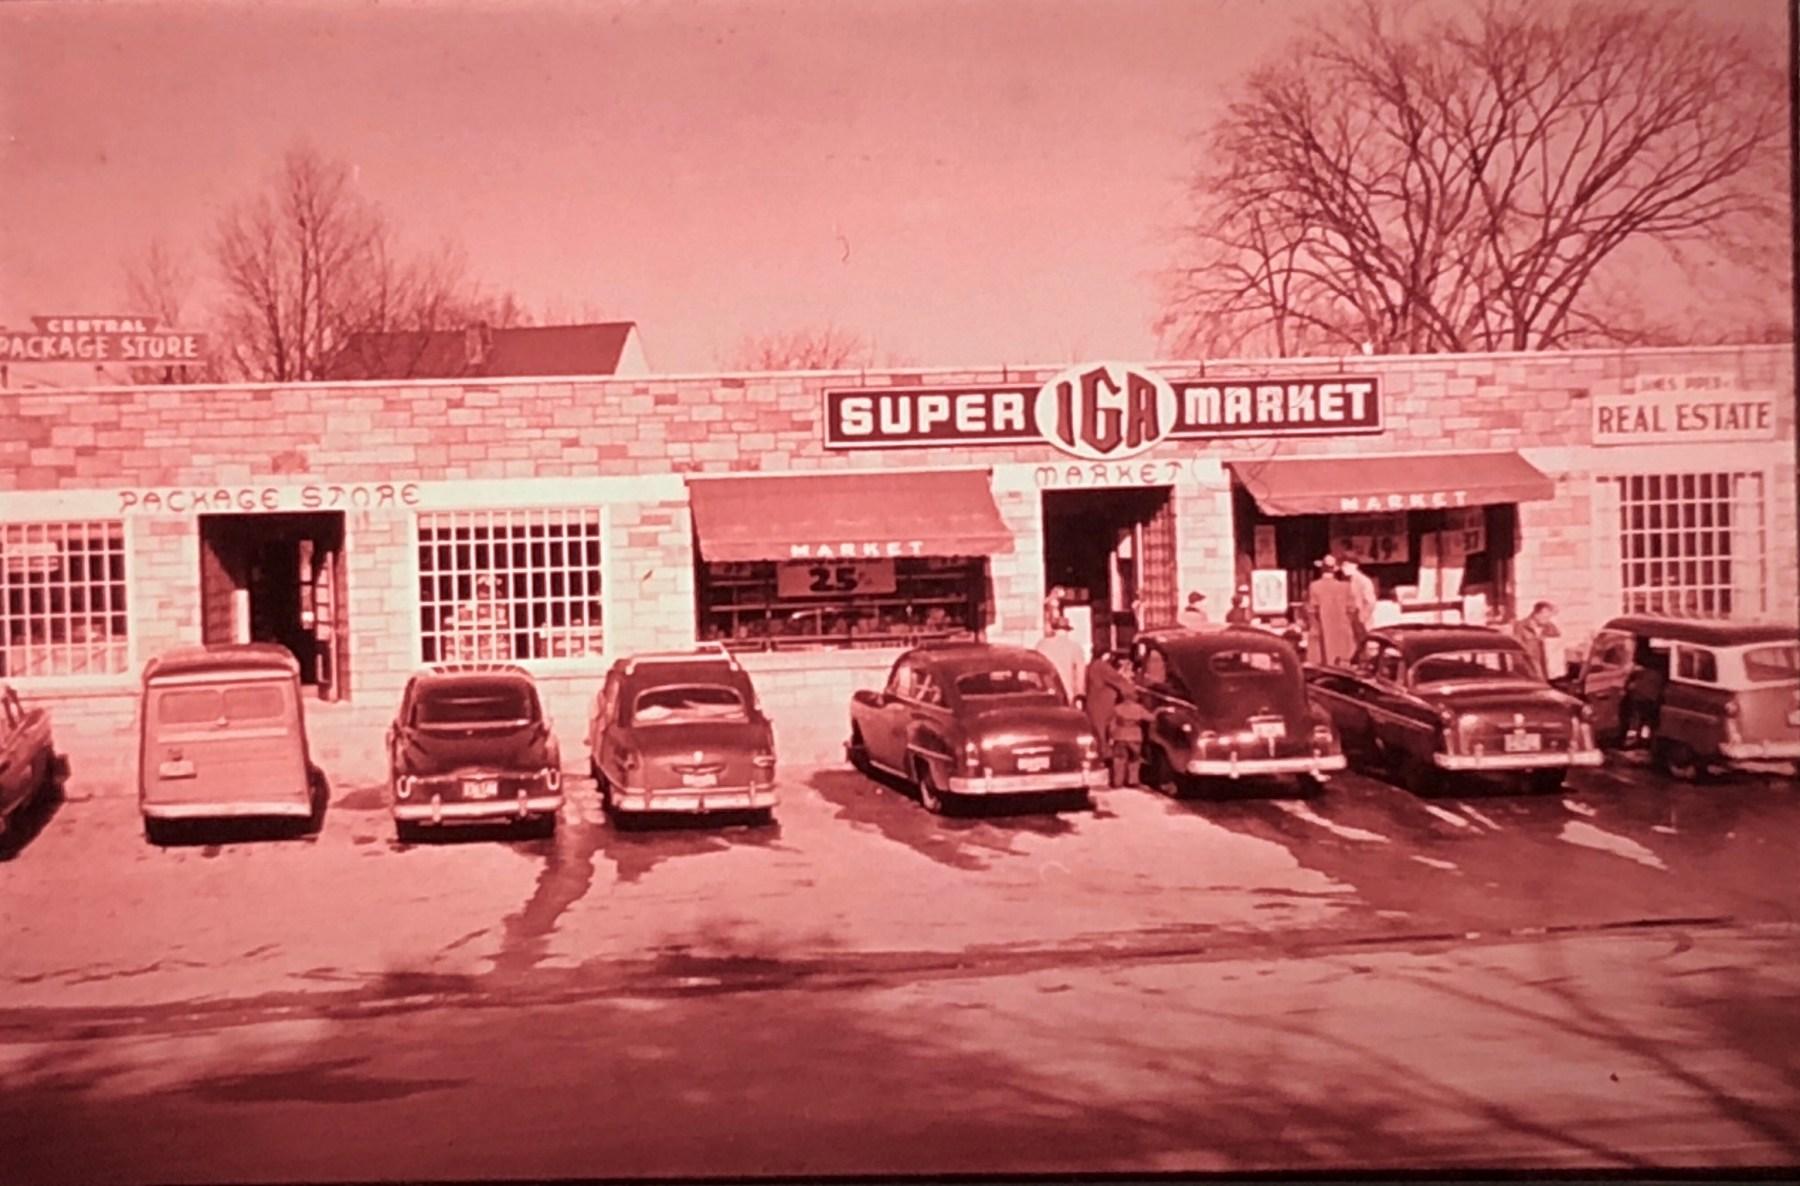 Super IGA Market Burlington MA